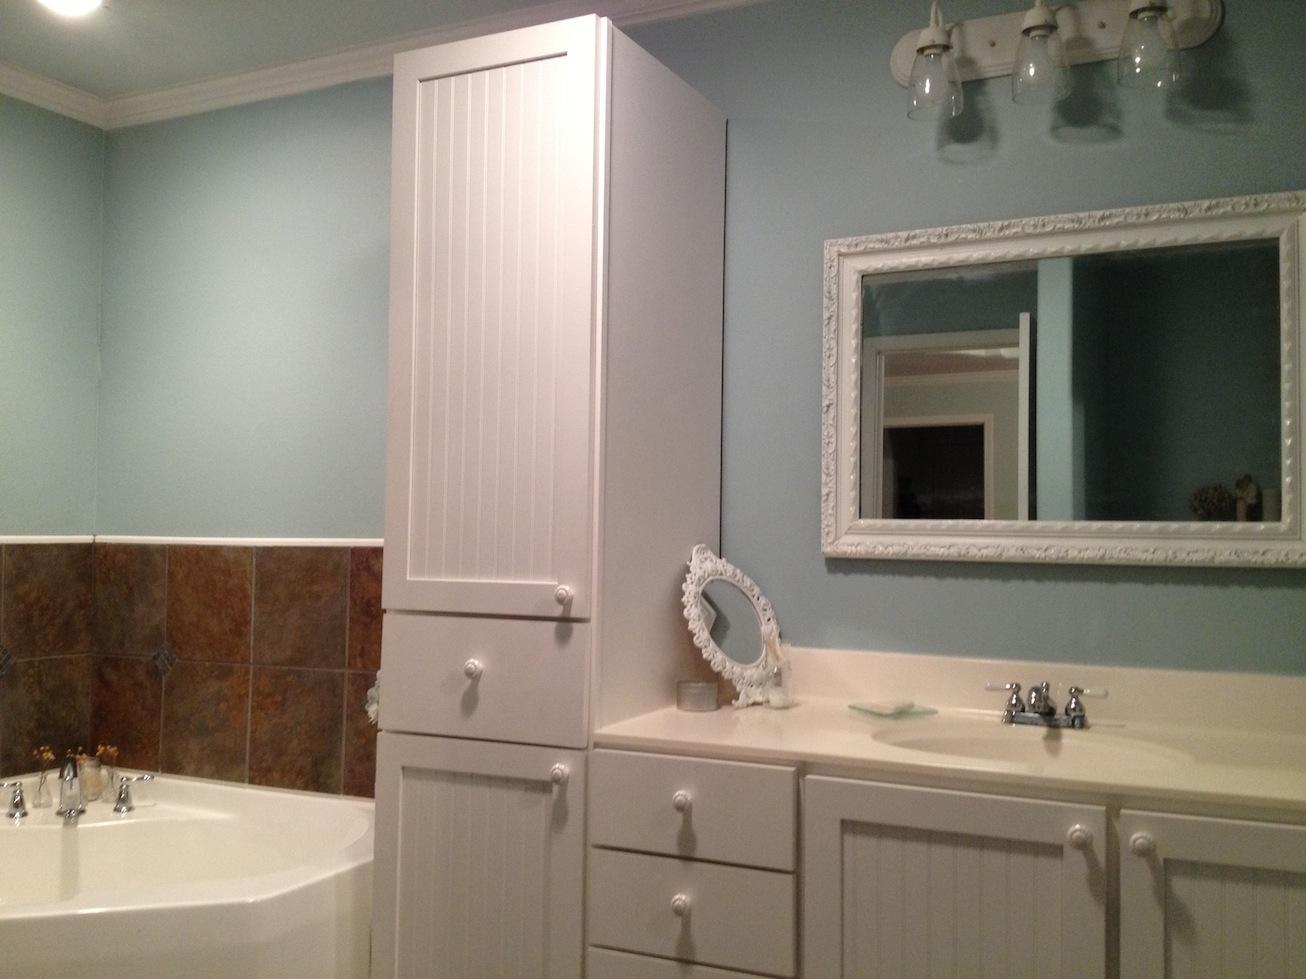 Vanity Mirror With Lights Craigslist : Titus 2 Work in Progress: Master Bath Reveal